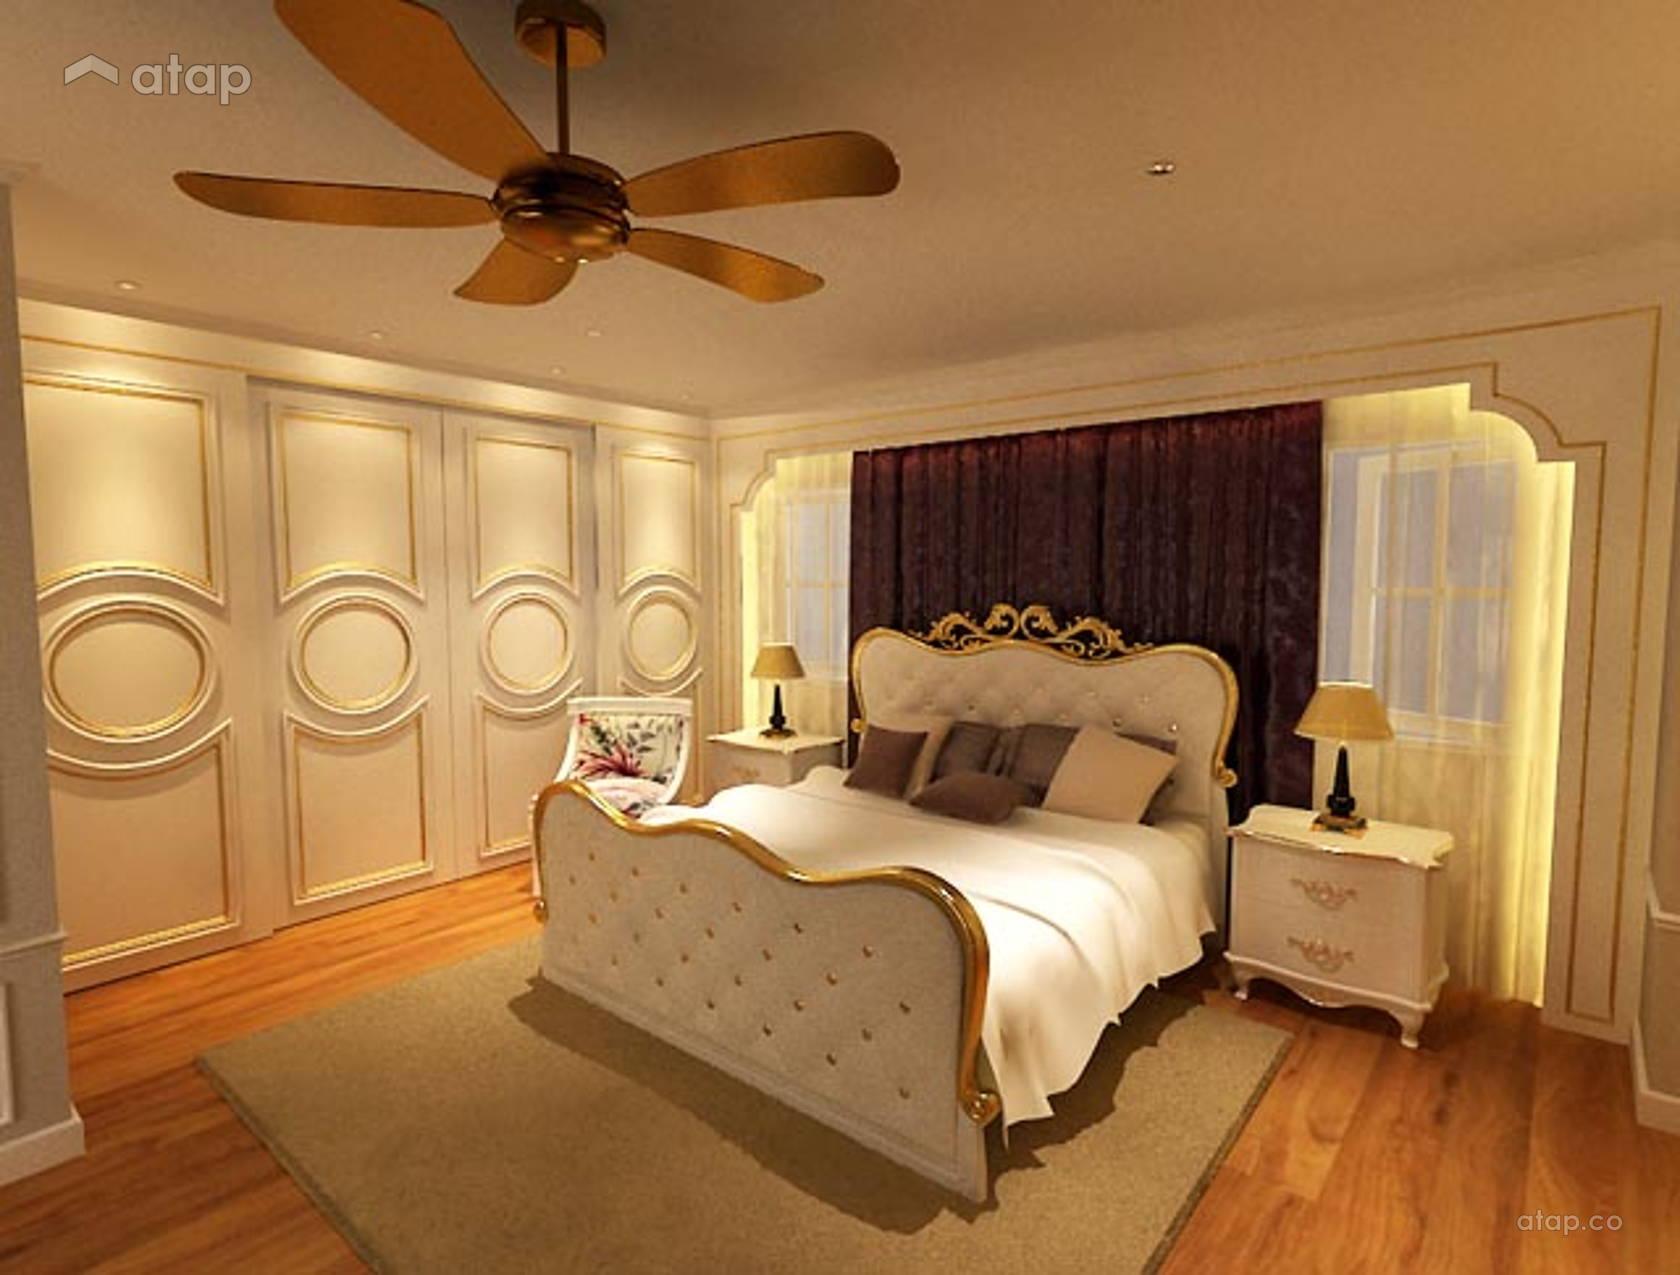 Two & Half Storey Bungalow House - Mutiara Damansara interior design ...